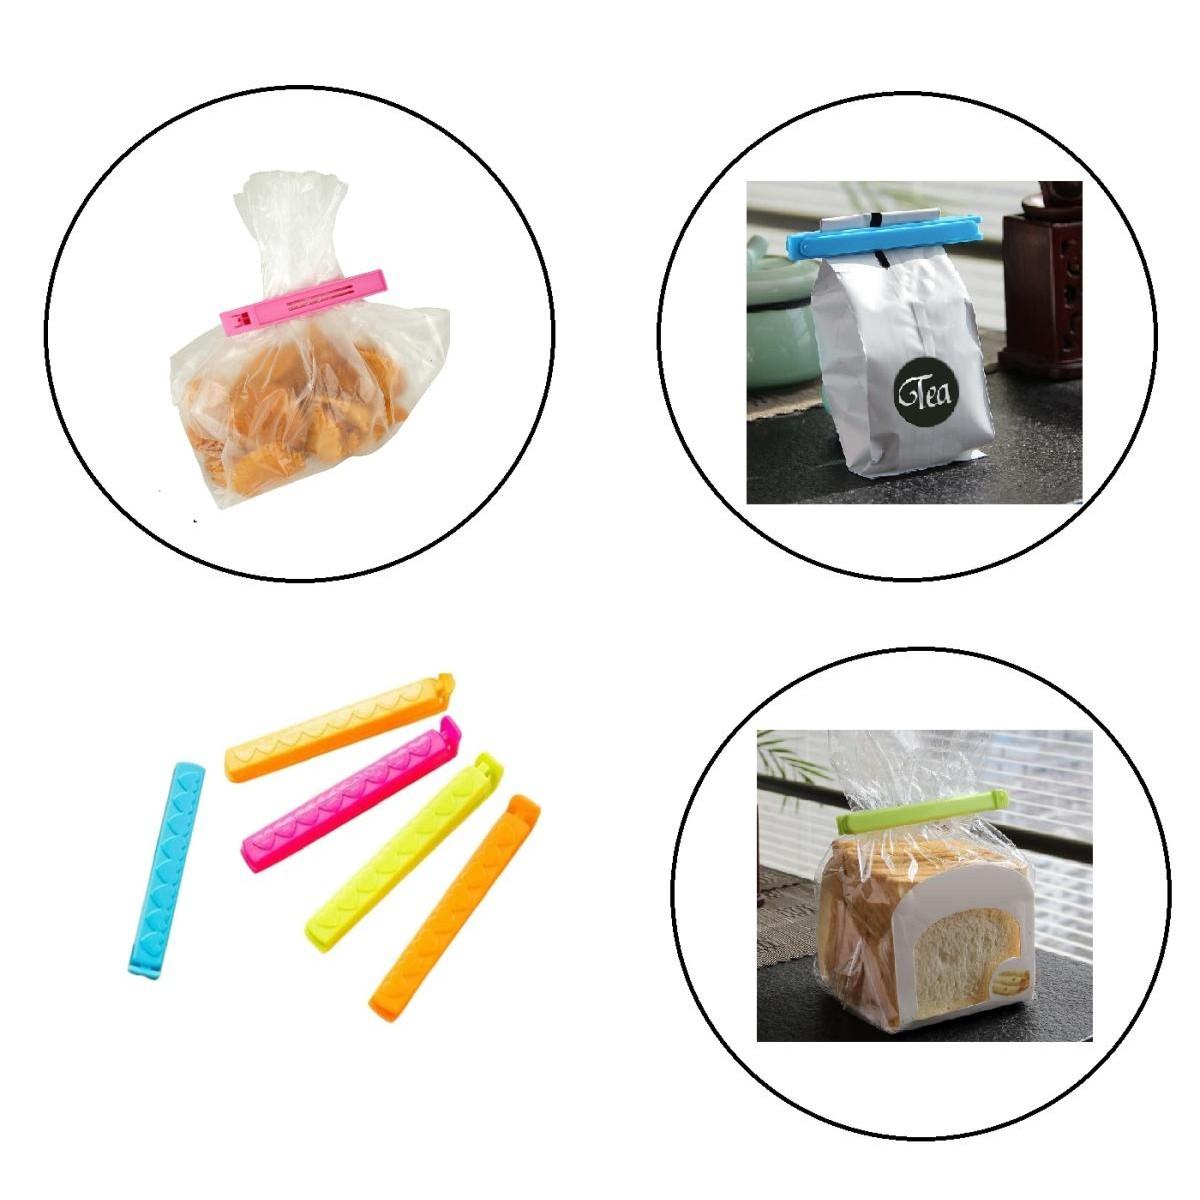 Pack of 5 - Multicolor Reusable Plastic Food Snack Storage Seal Sealing Bag Clips Sealer Clamp Plastic Tool